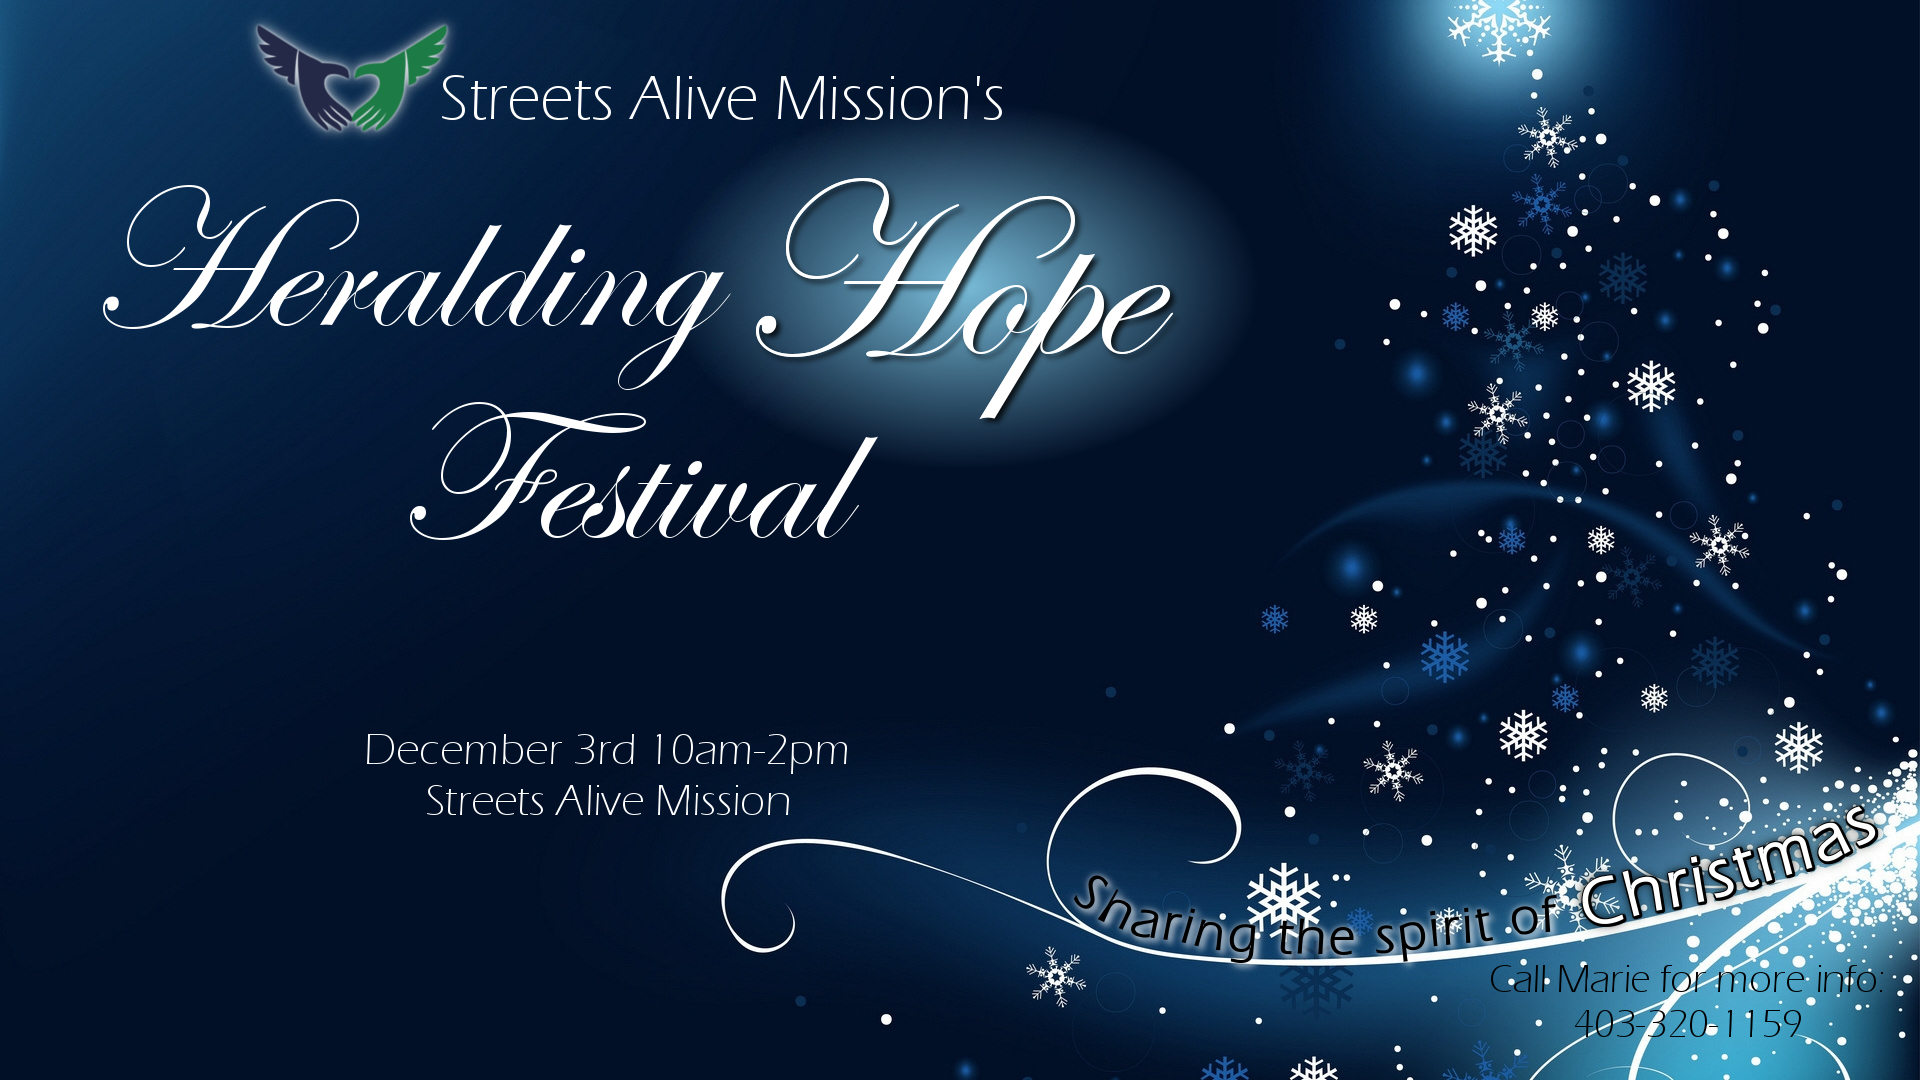 Heralding Hope Festival 2016 - Streets Alive Mission